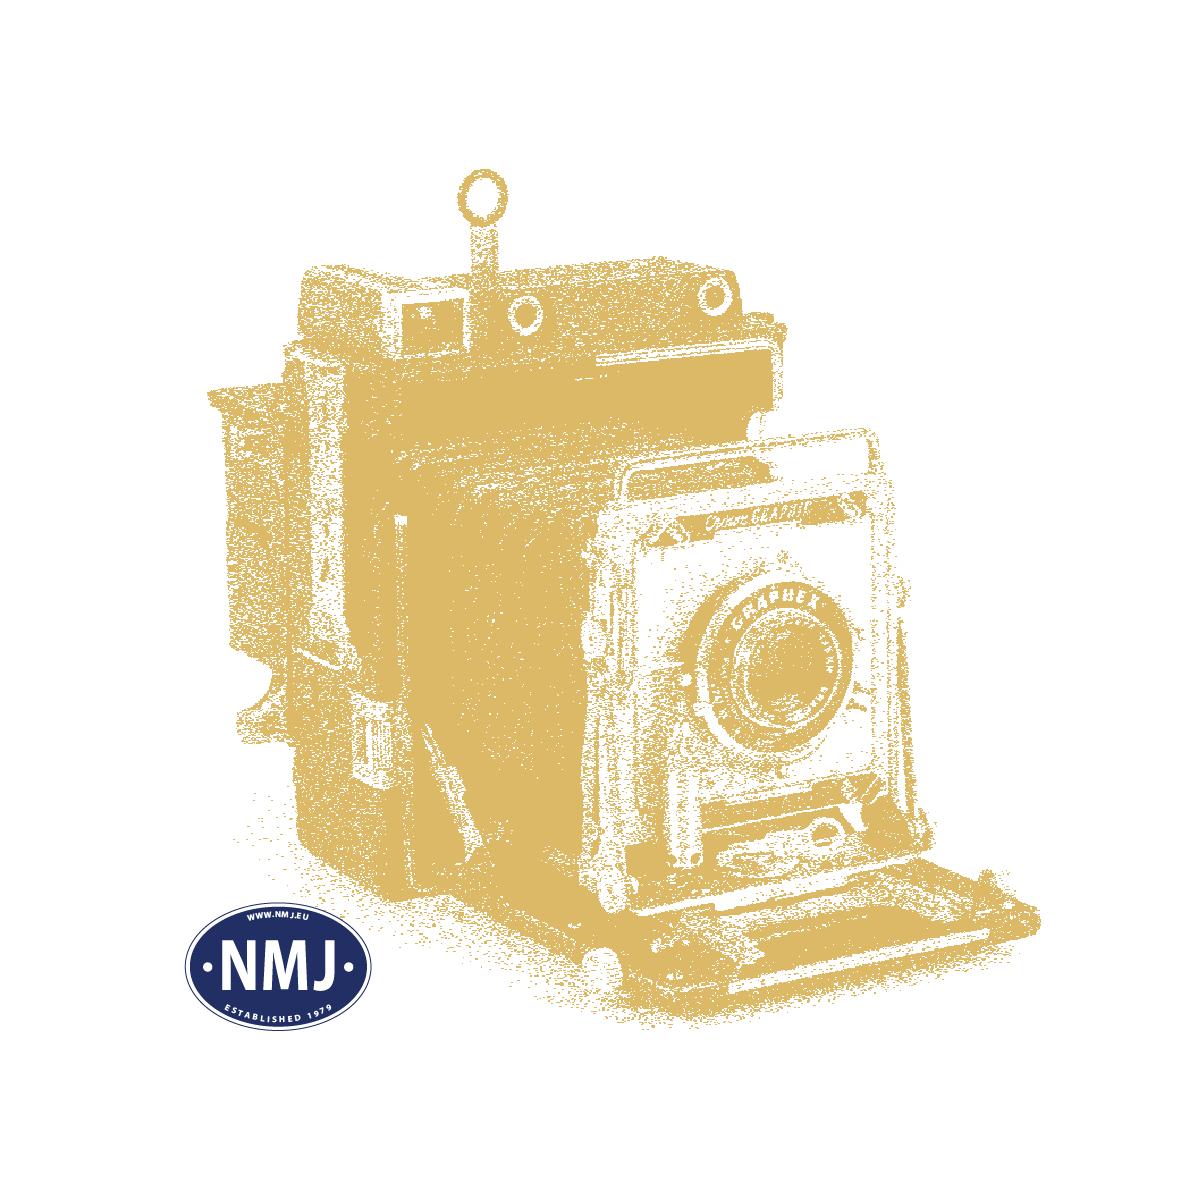 NMJT699.101 - *NMJ Exclusive* Volvo Duett Findus